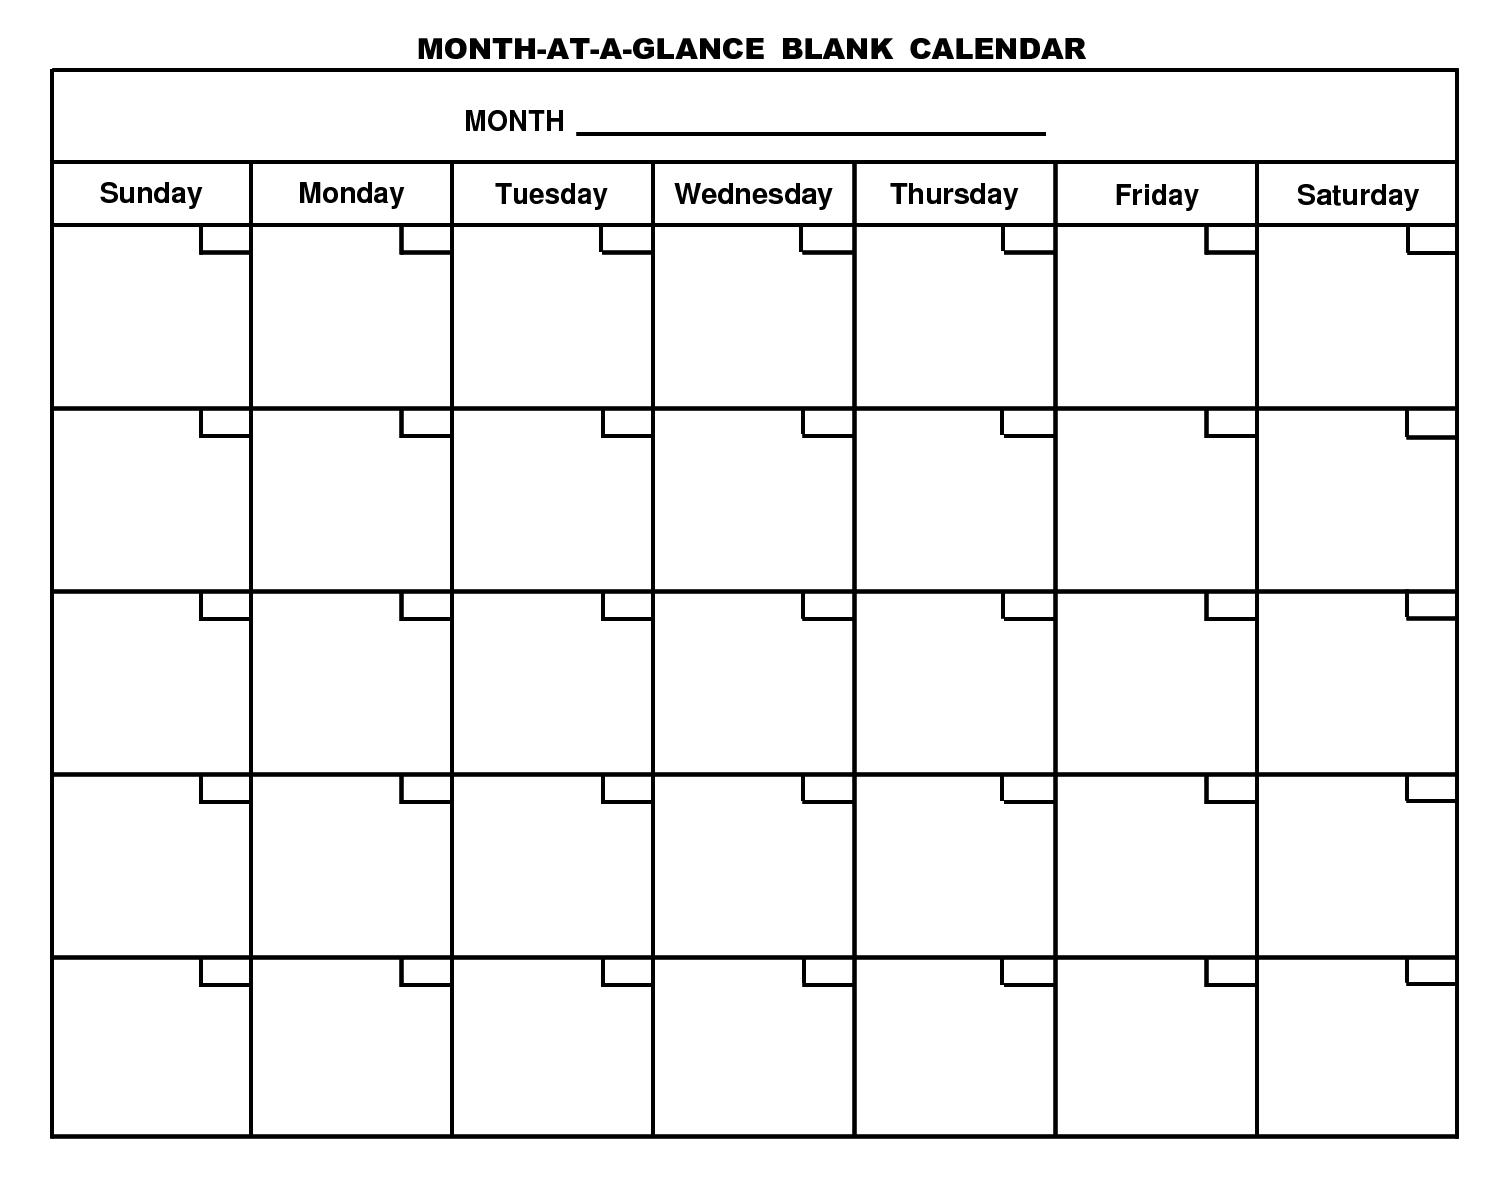 Print A Blank Calendar - Ataum.berglauf-Verband_Outlook Calendar Printing Blank